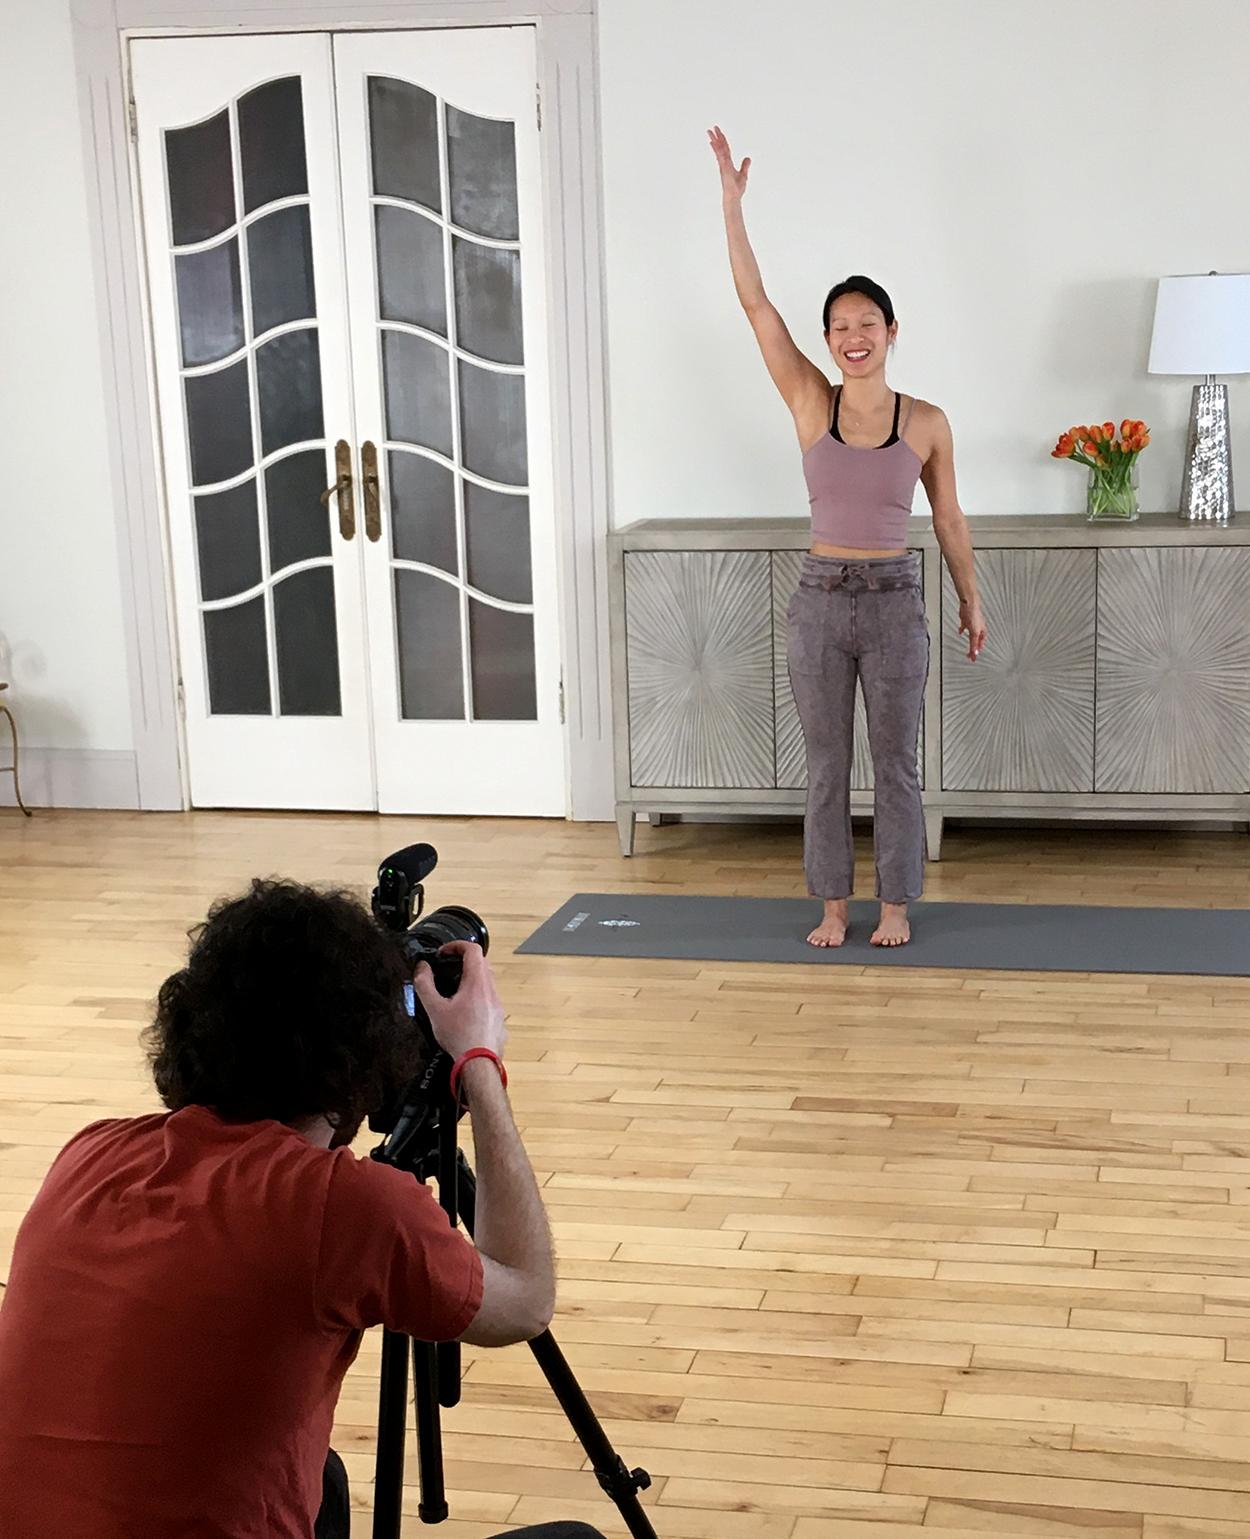 Vanessa Demonstrates Stretch Moves